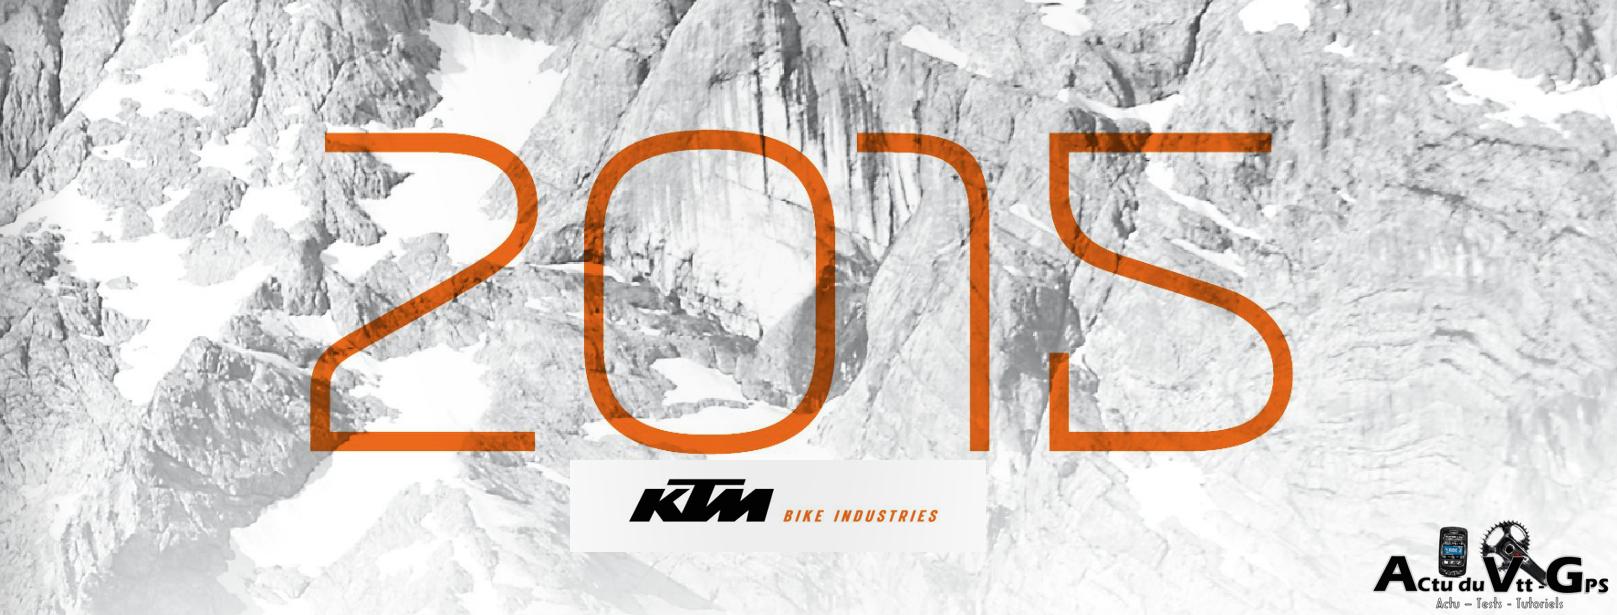 CATALOGUE KTM 2015